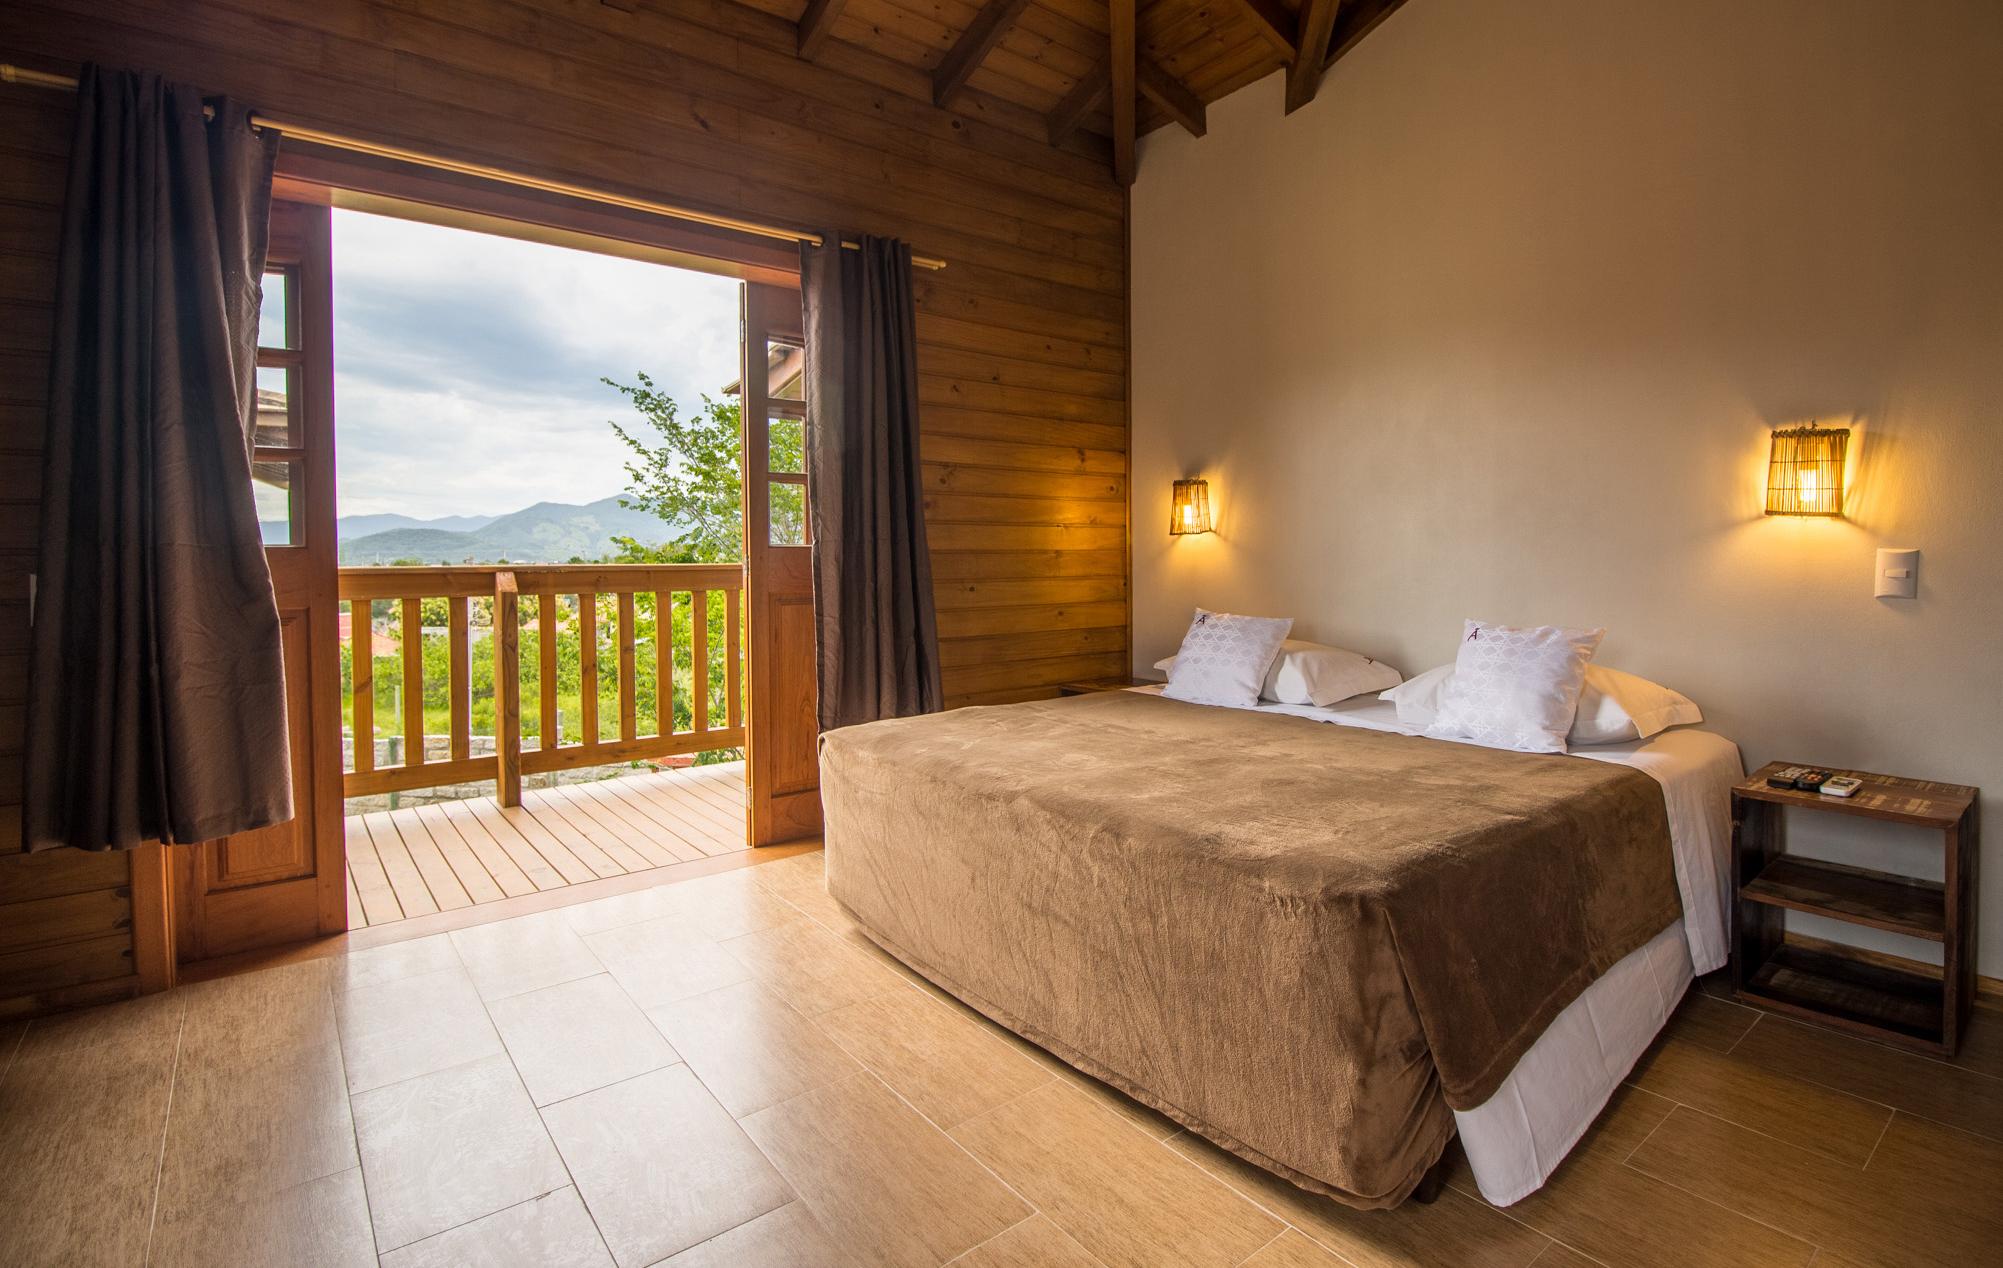 hotel-rossoma-pousada-na-praia-do-rosa-santa-catarina-cama-casal